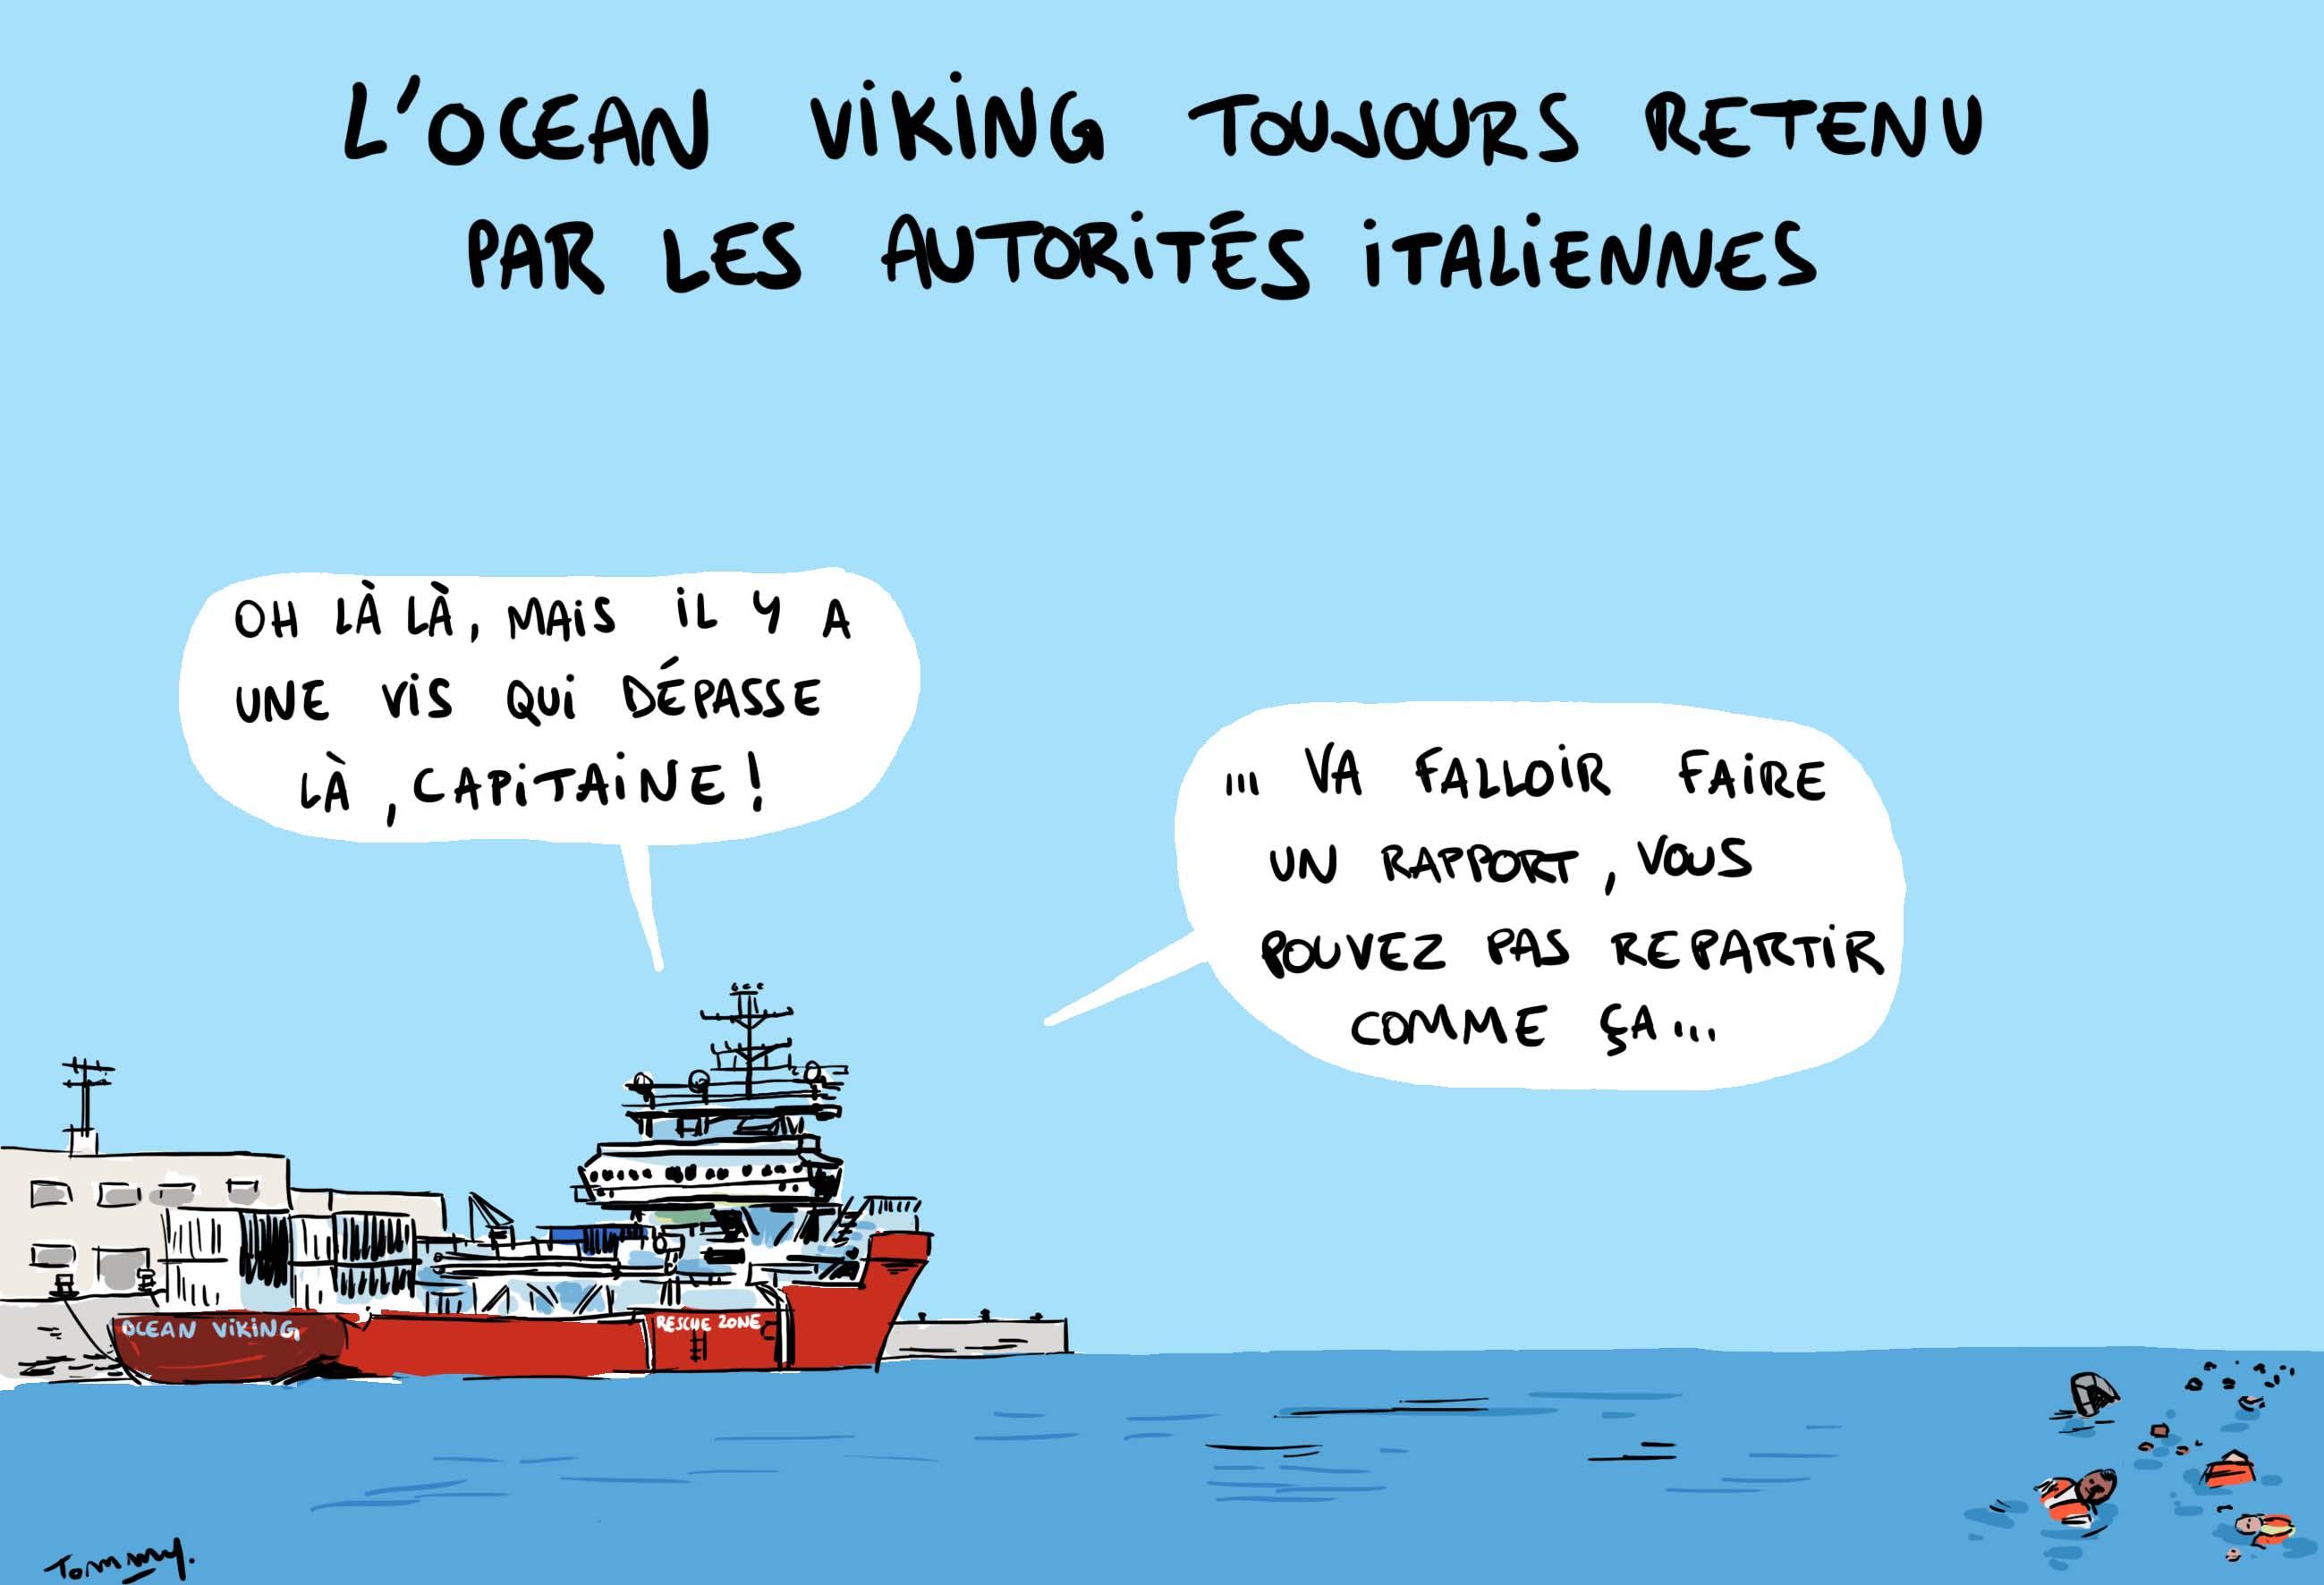 Ocean Viking